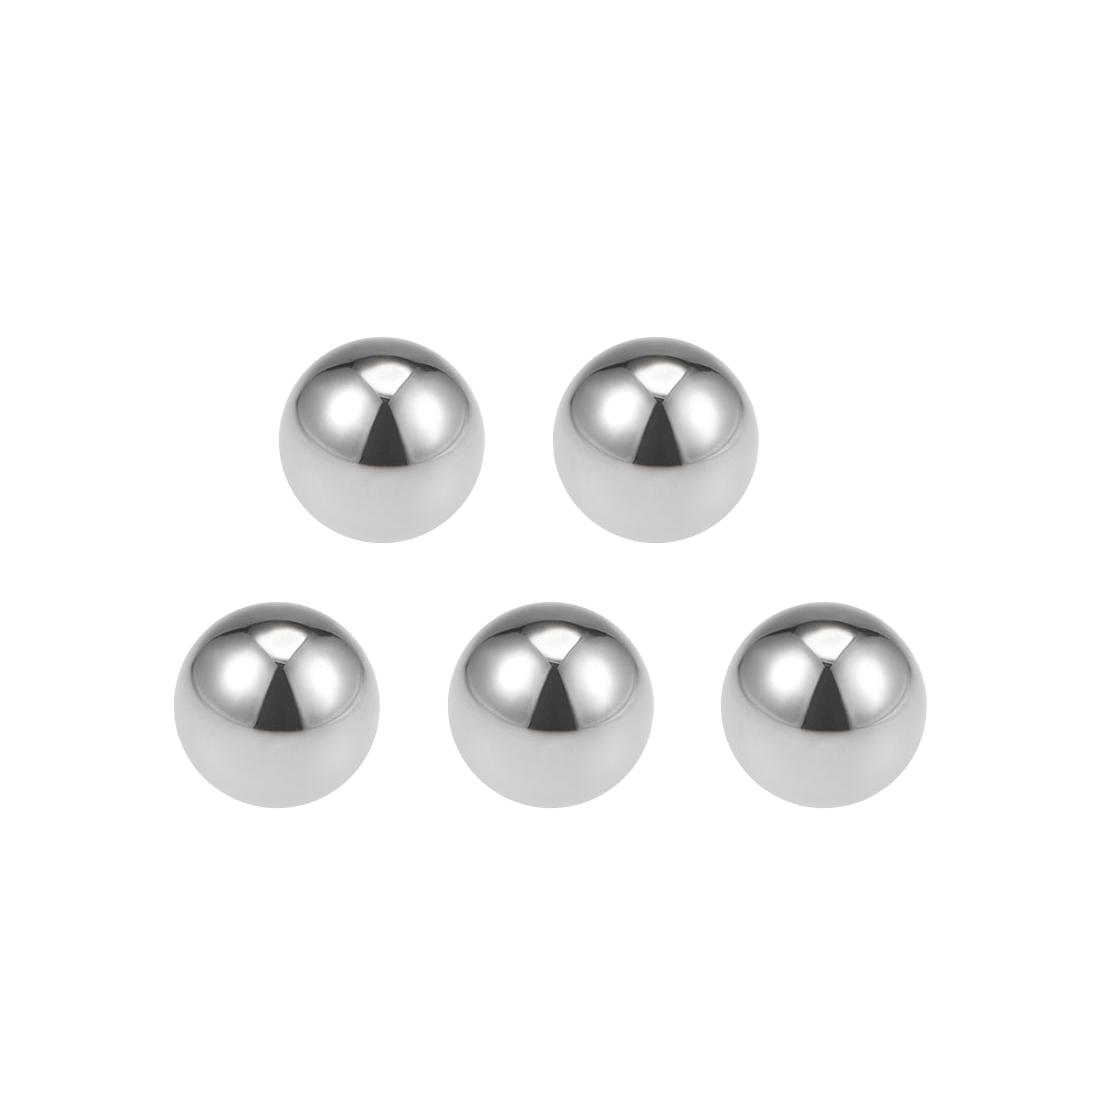 4mm Bearing Balls Tungsten Carbide G25 Precision Balls 5pcs